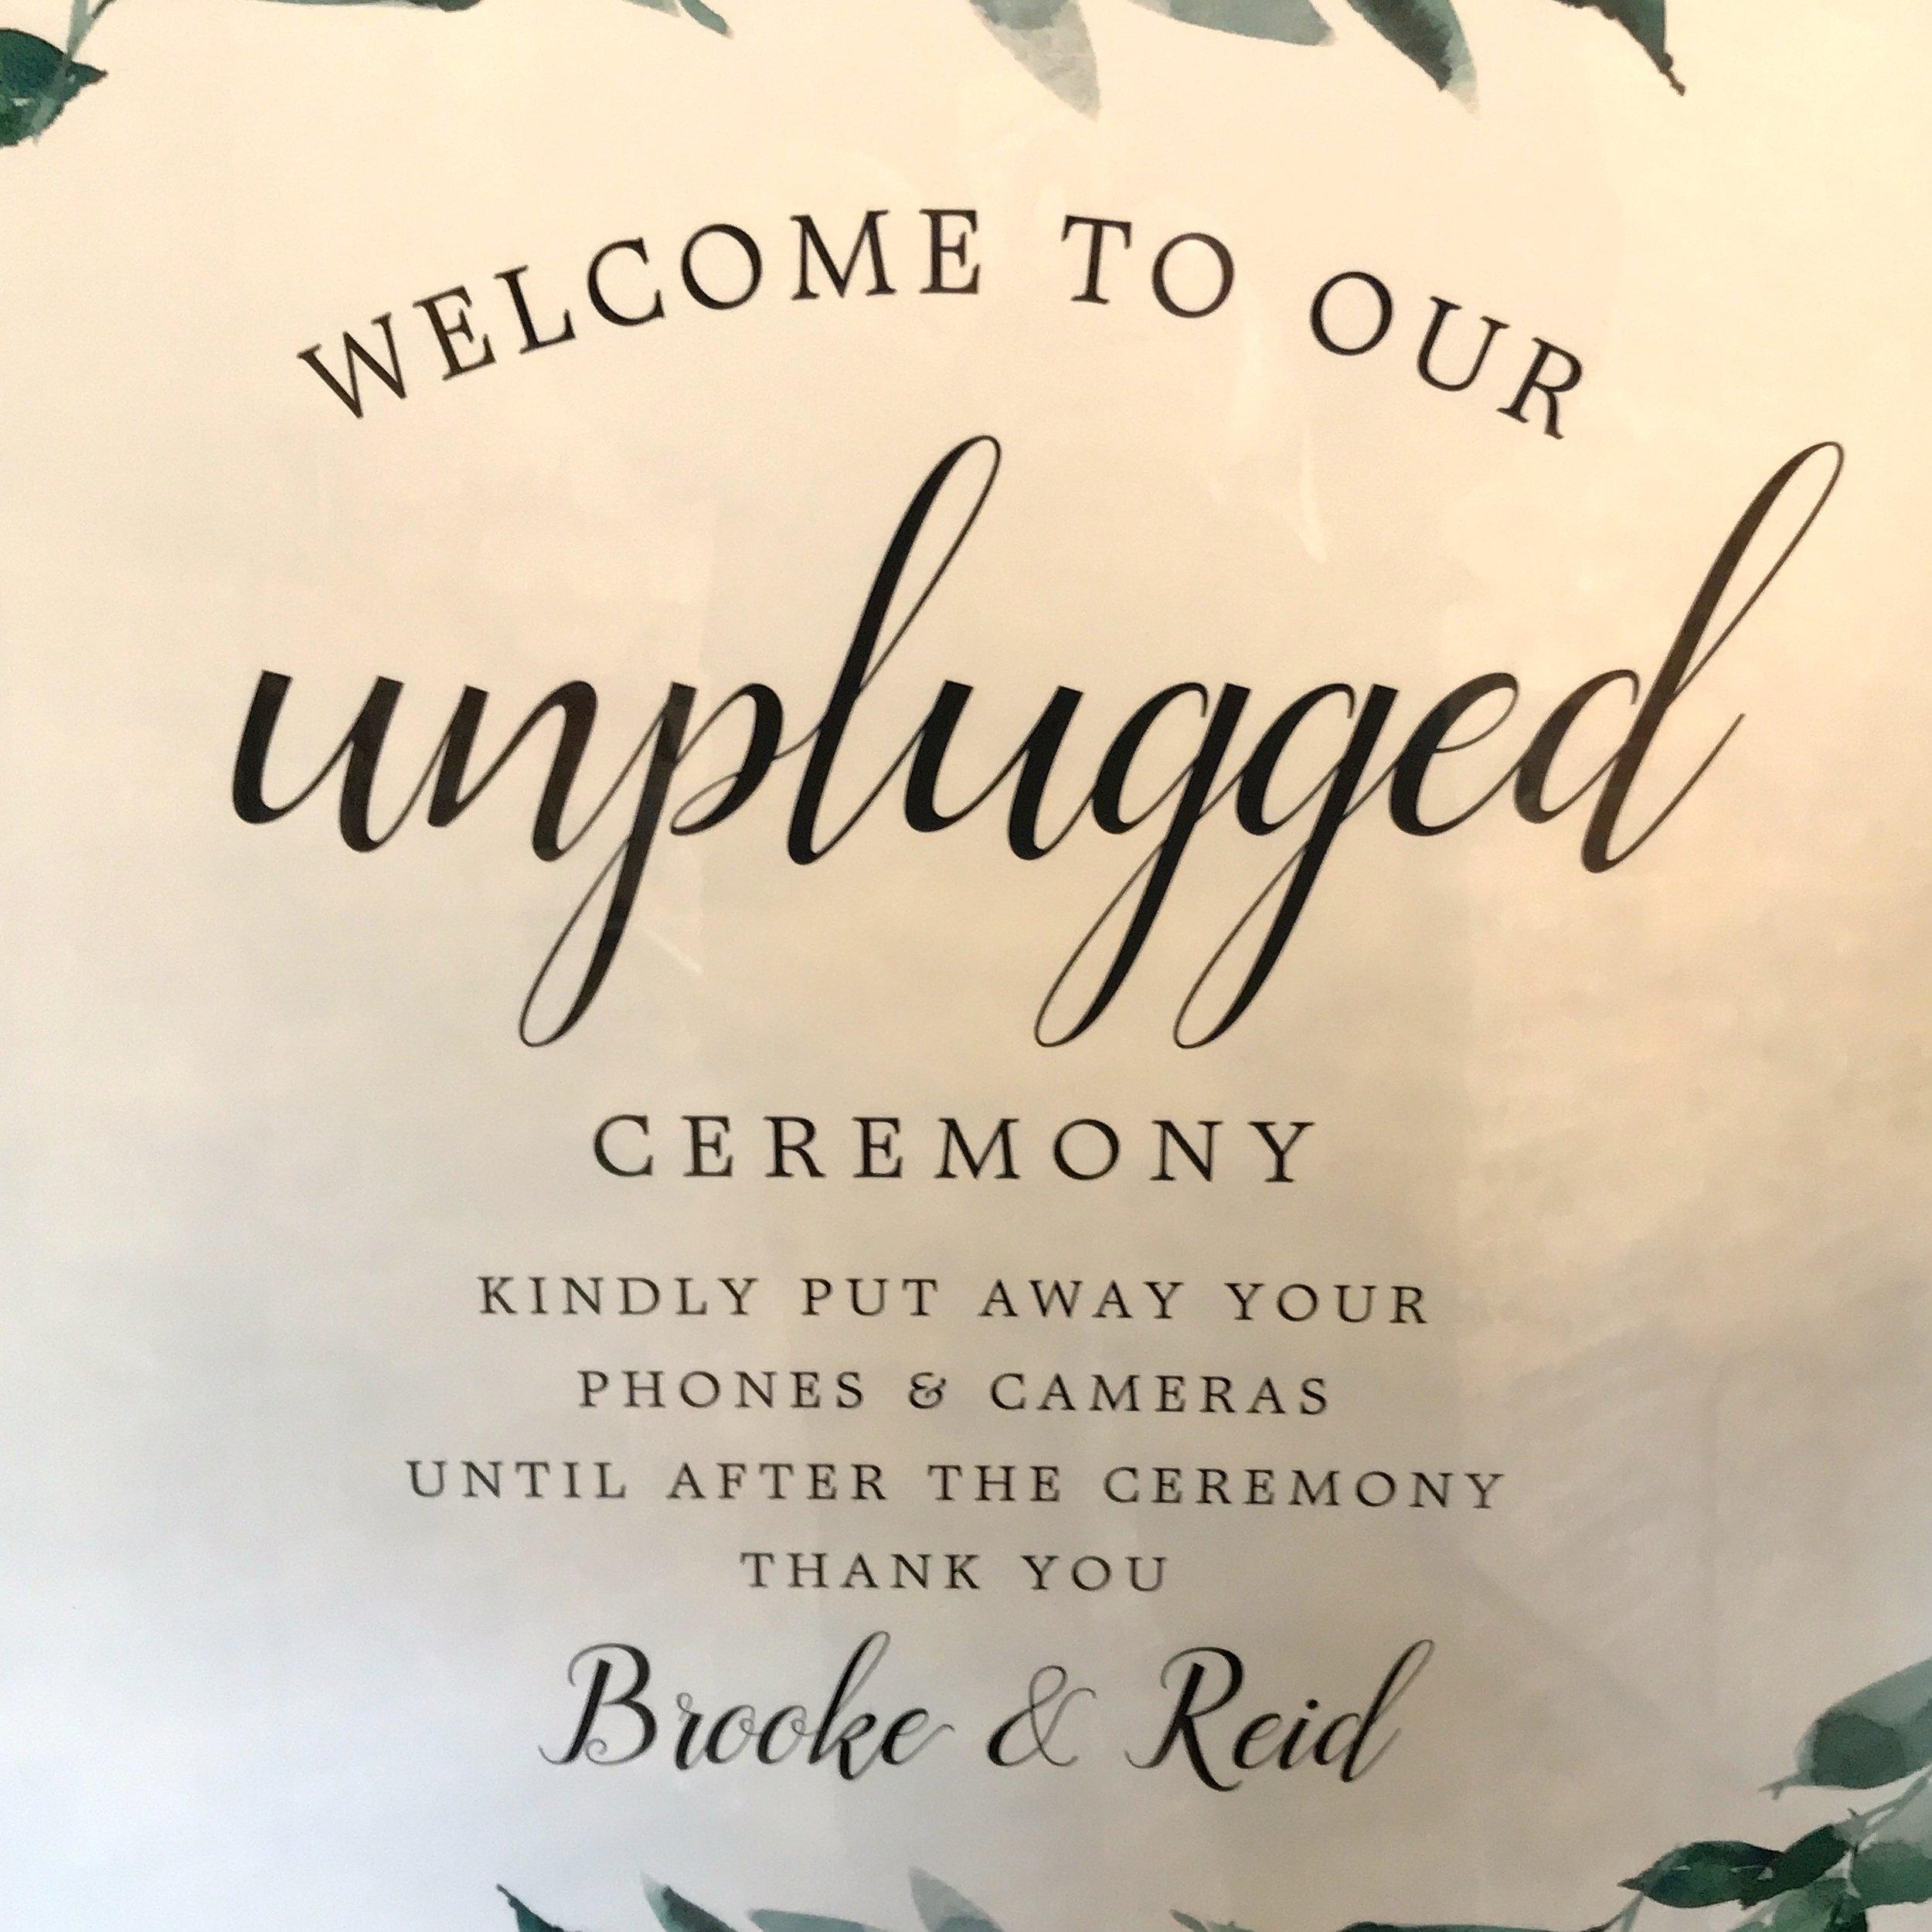 Brooke & Reid Unplugged by DJ Jim Cerone